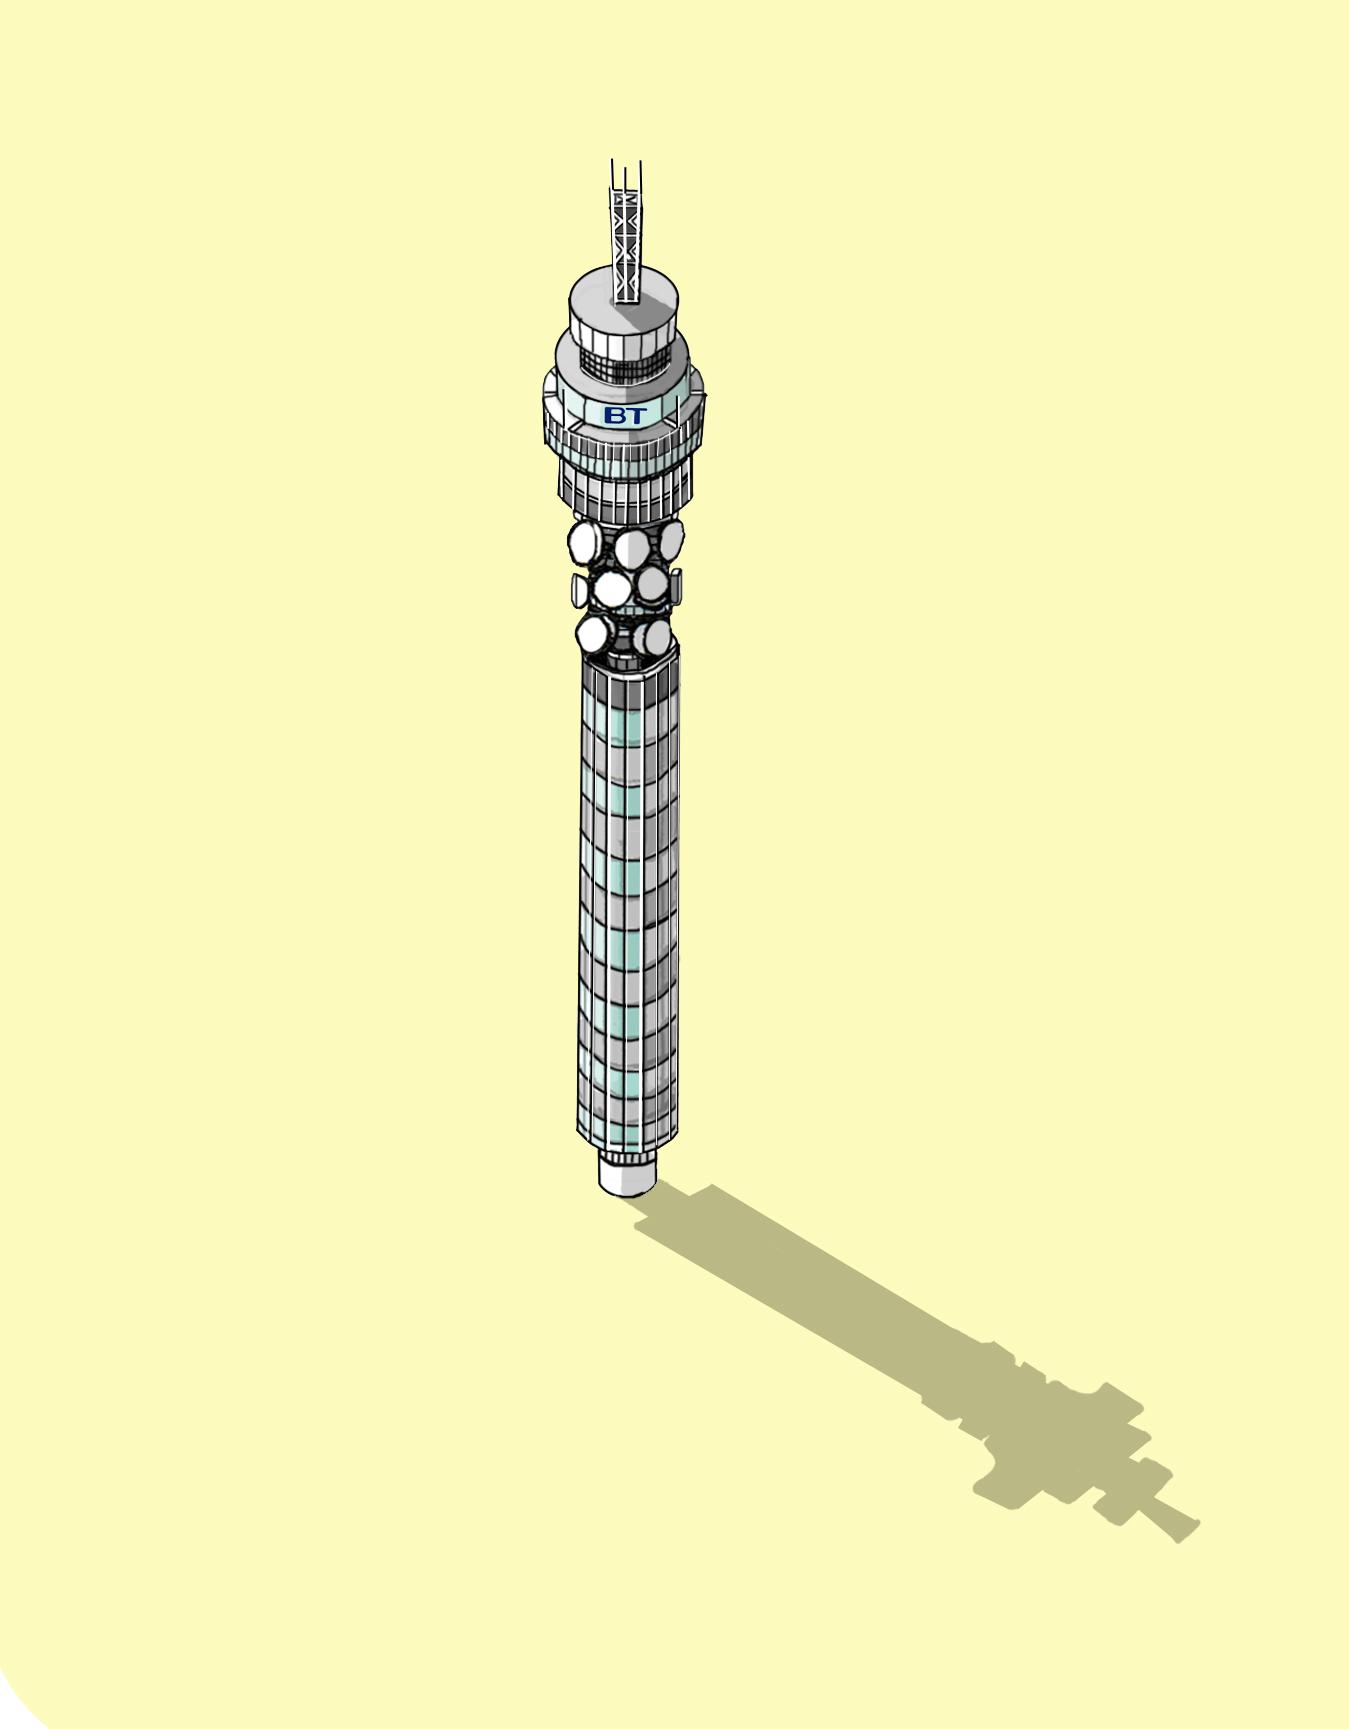 The Telecom Tower  Illustration by Katherine Baxter